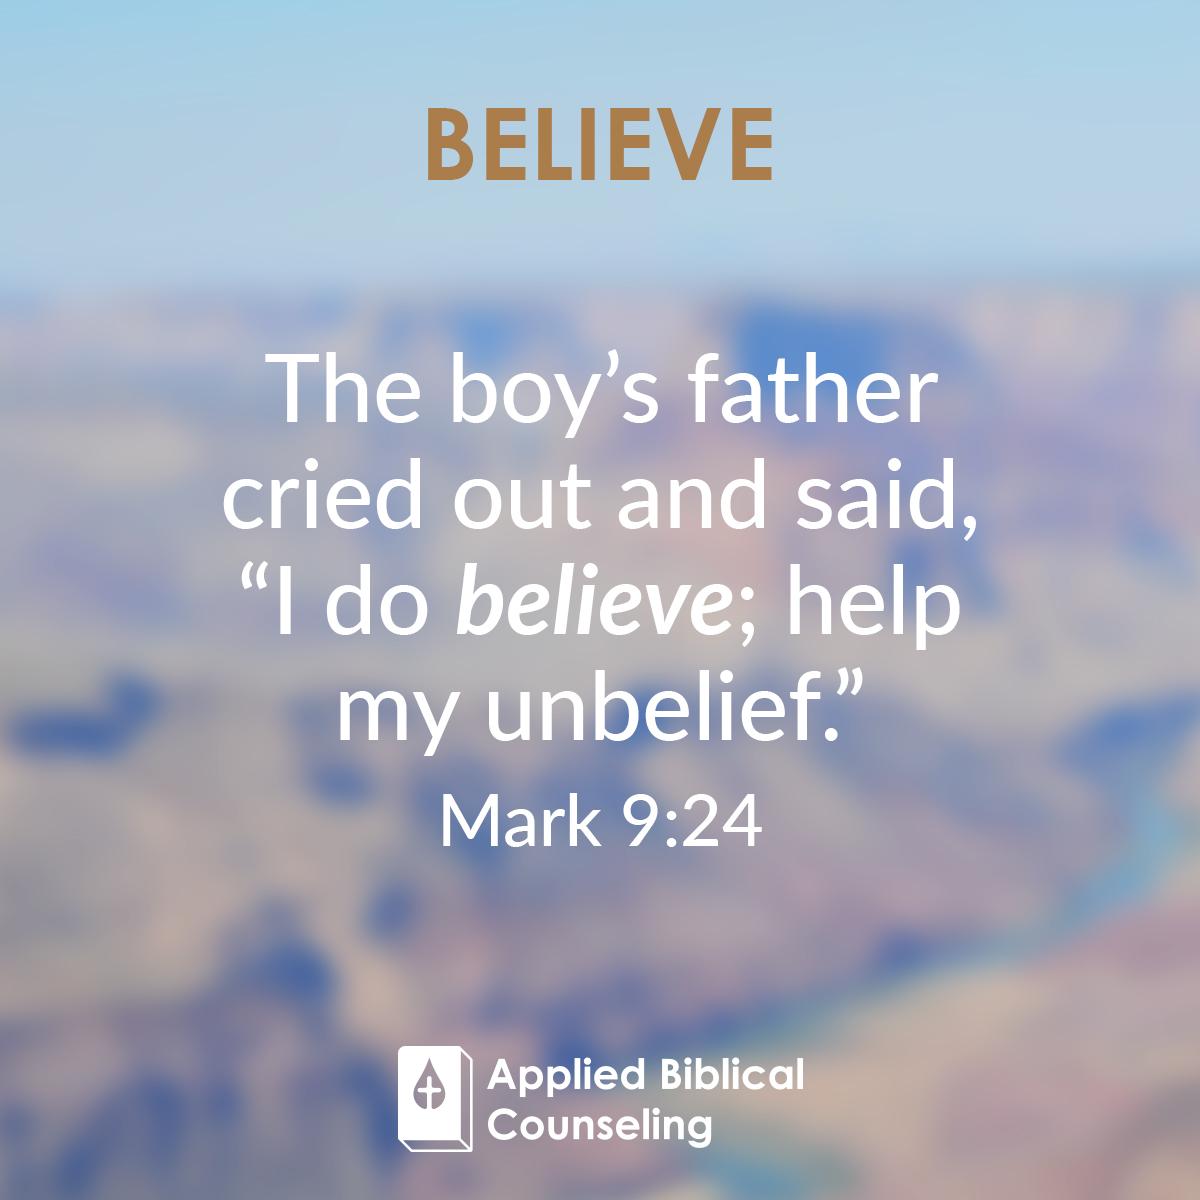 applied biblical counseling facebook w17 believe 2